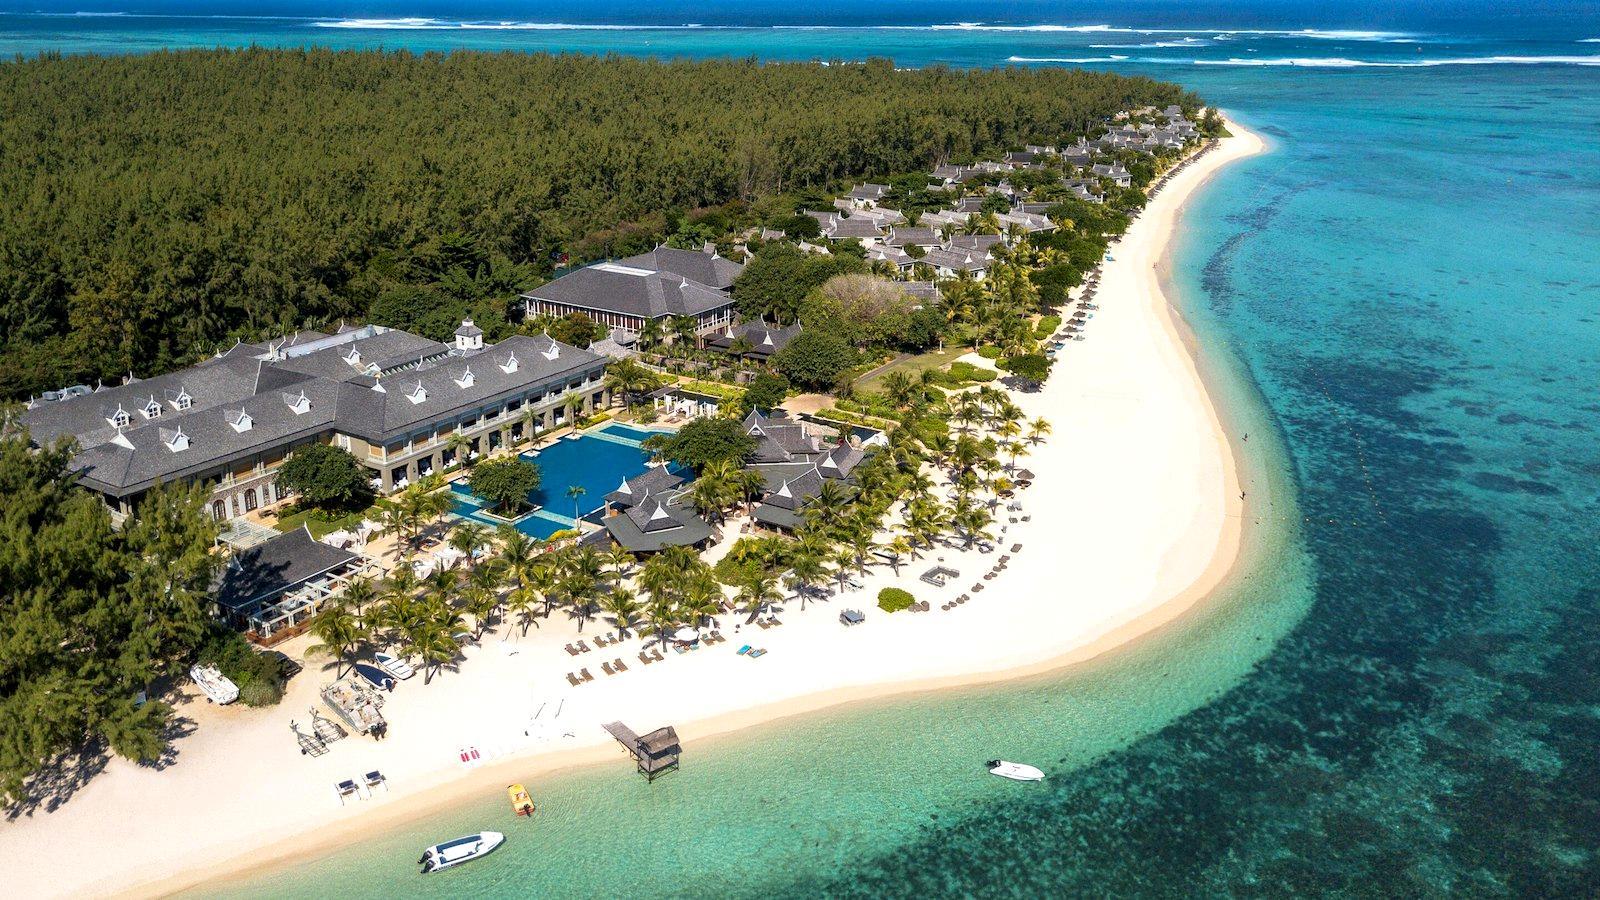 St. Regis Mauritius �Downgraded� To A JW Marriott